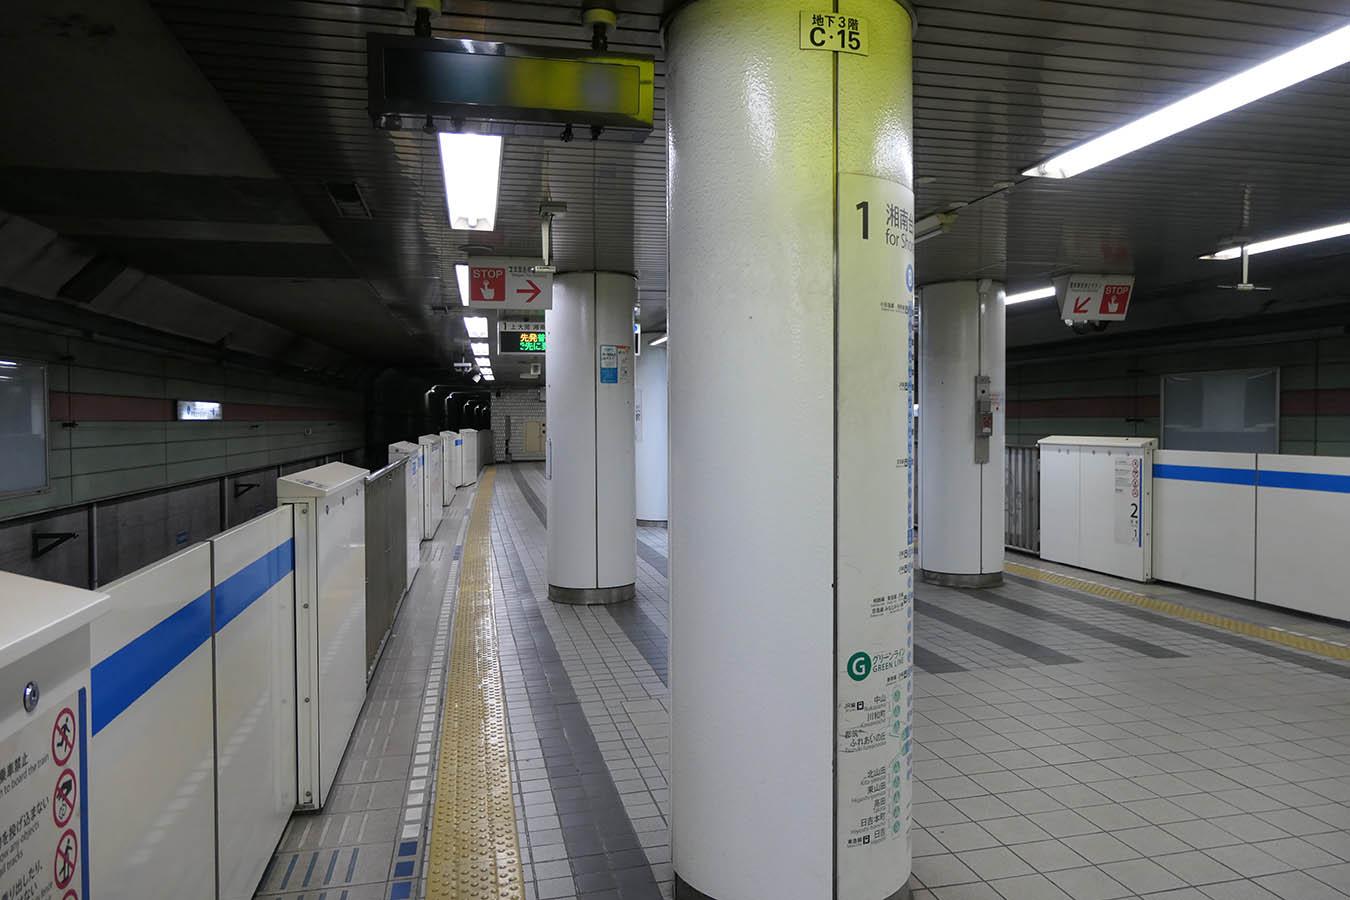 YMS-B16_photo04.jpg